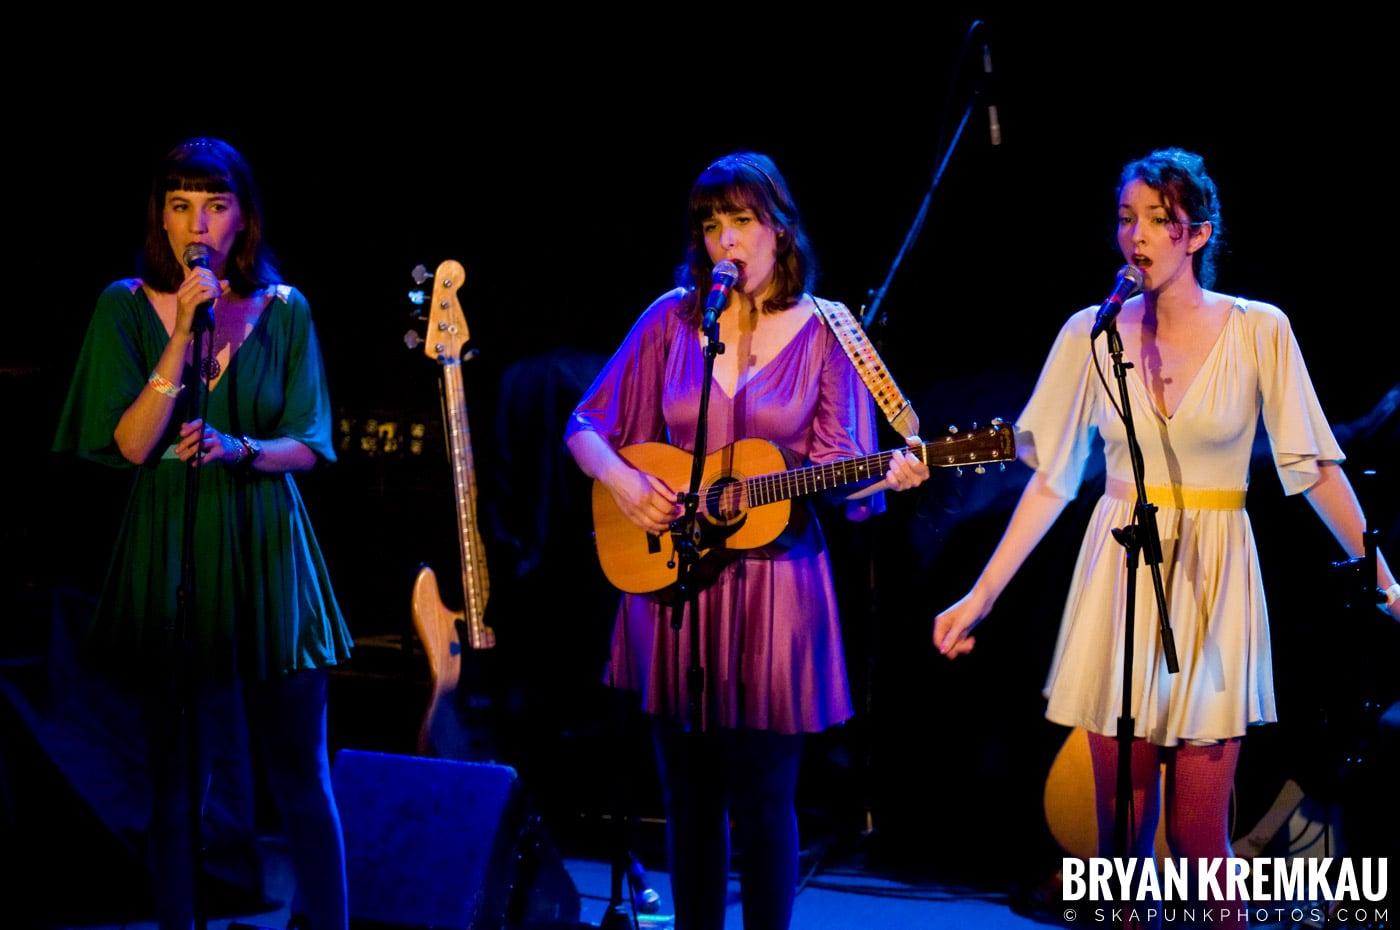 Living Sisters @ Bowery Ballroom, NYC - 3.29.10 (3)